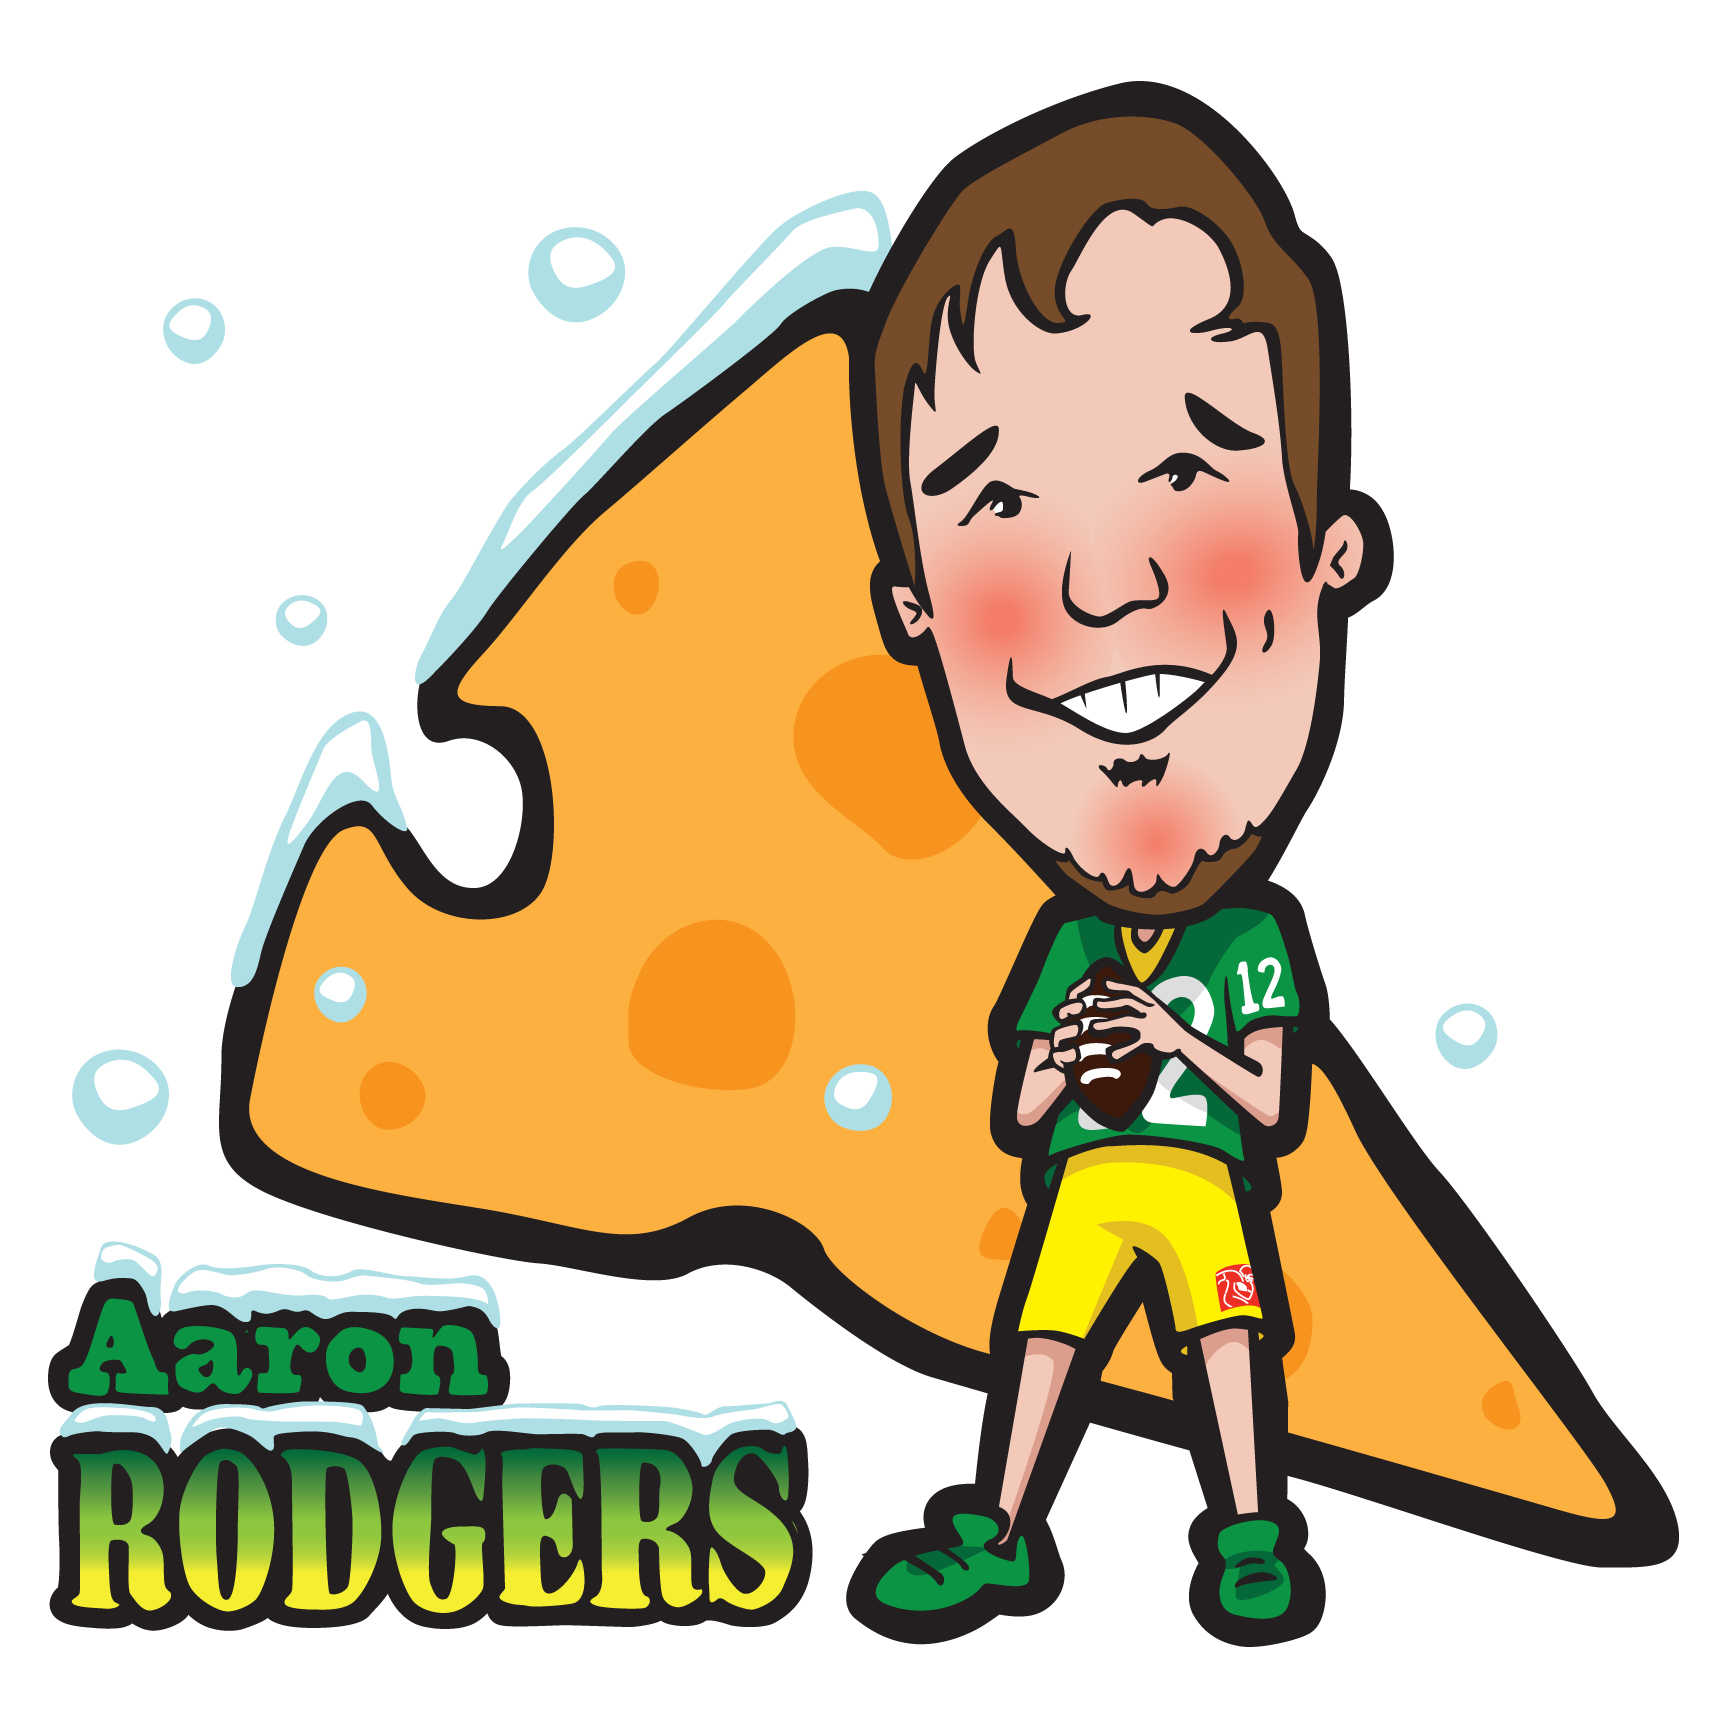 AaronRogers_CheeseWedge.jpg